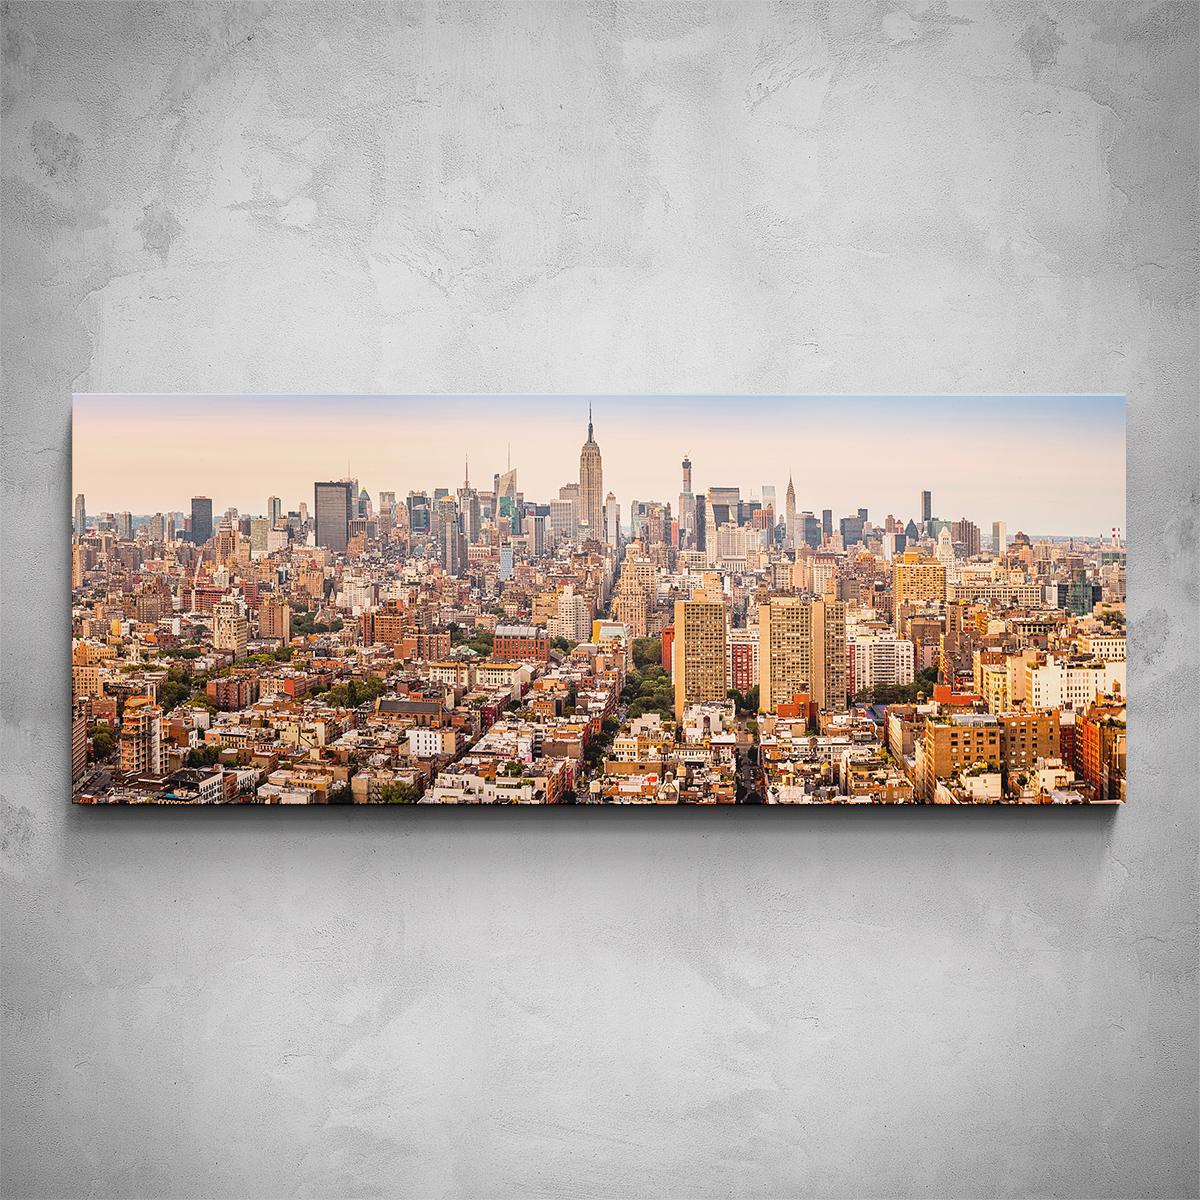 Obraz - New York Down Town - PopyDesign